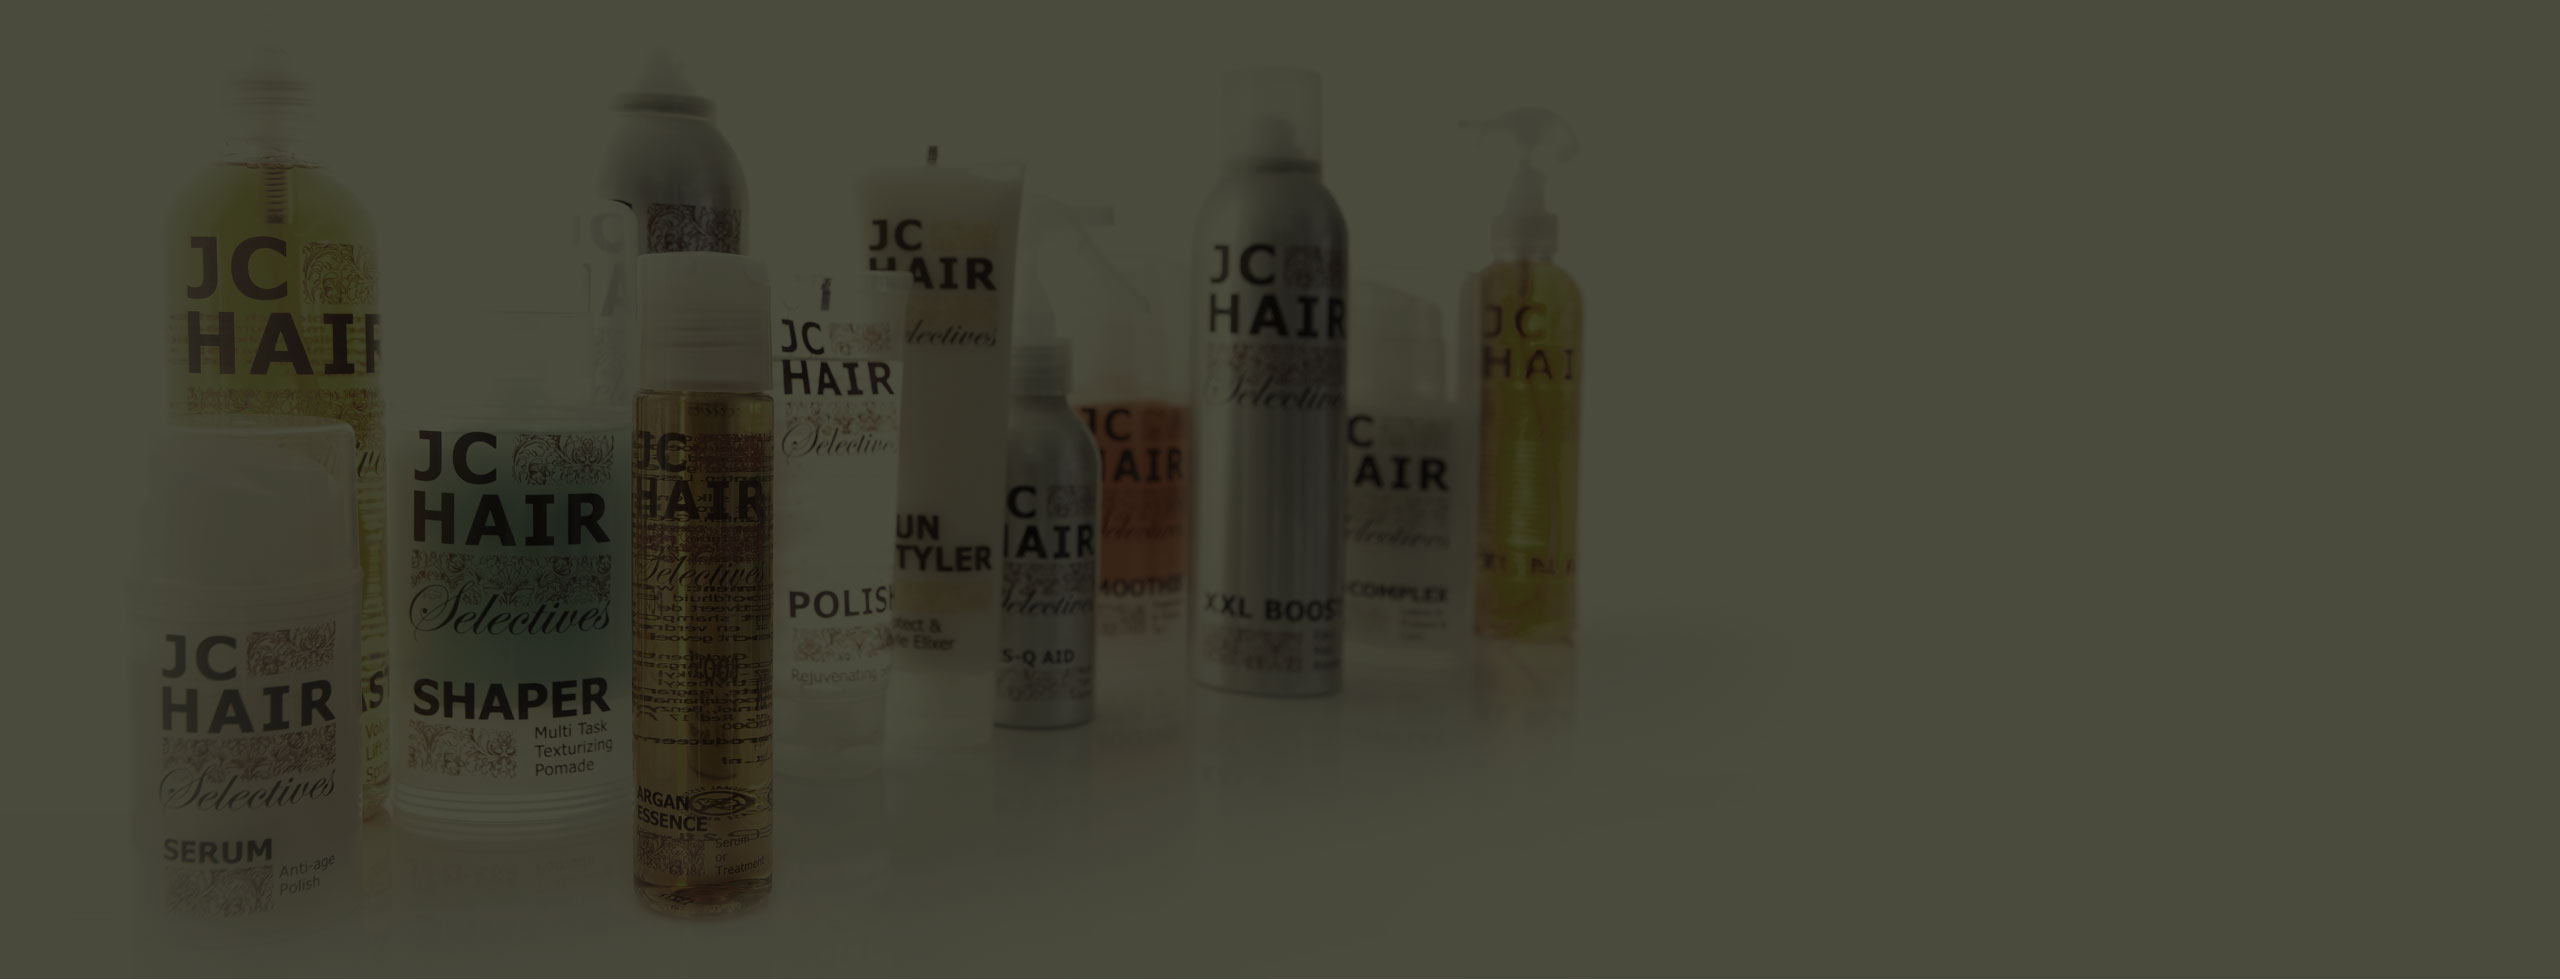 JC Hair & Spa | Pre-styling